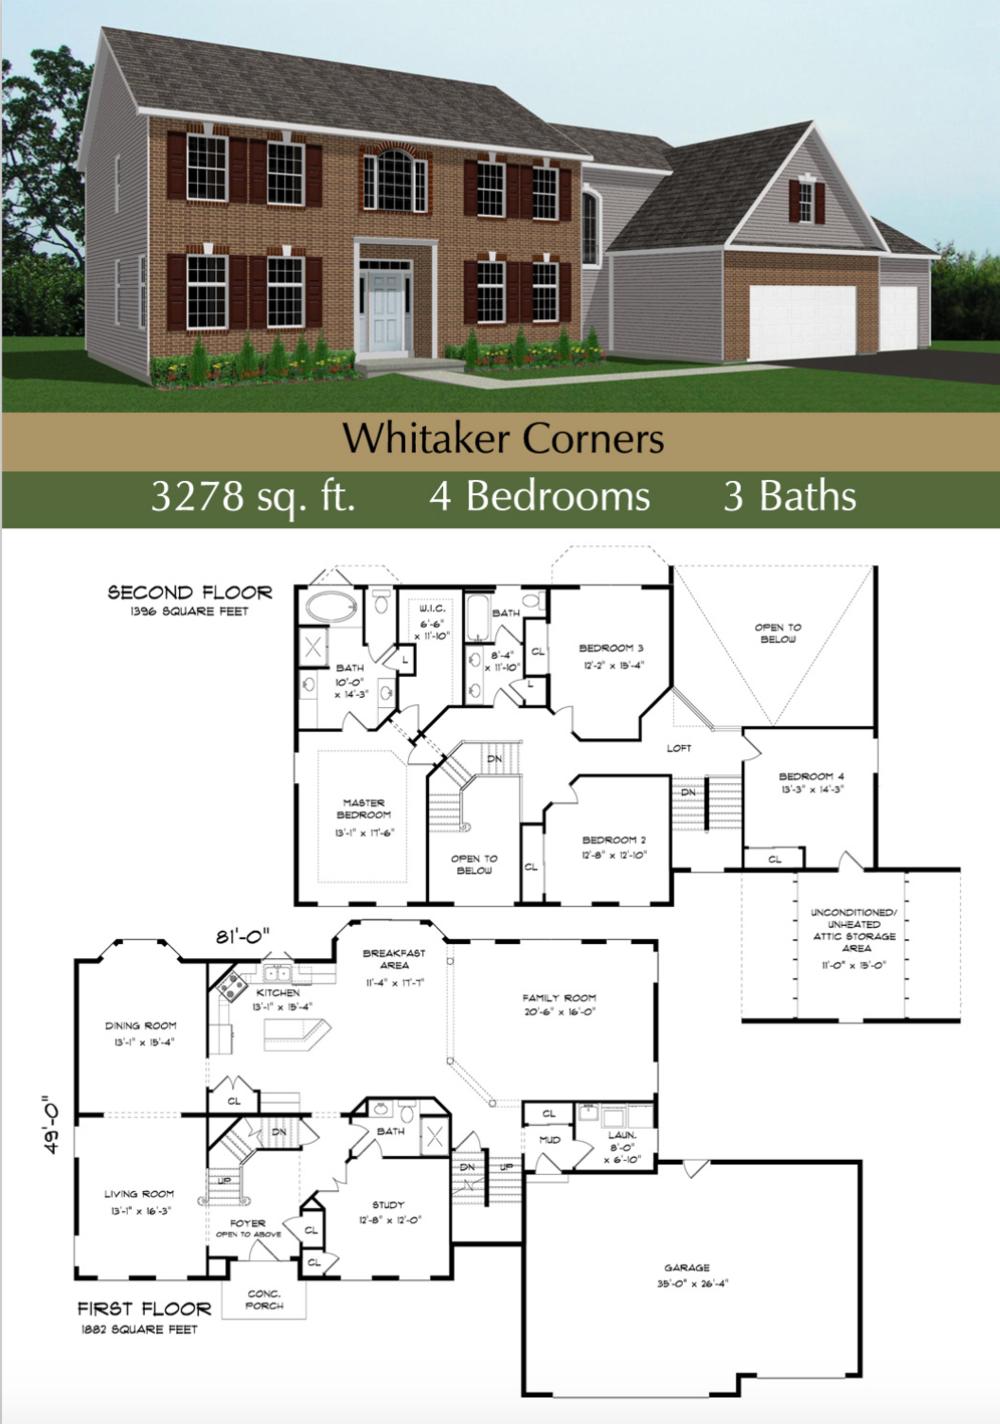 3278 Whitaker Corners.png